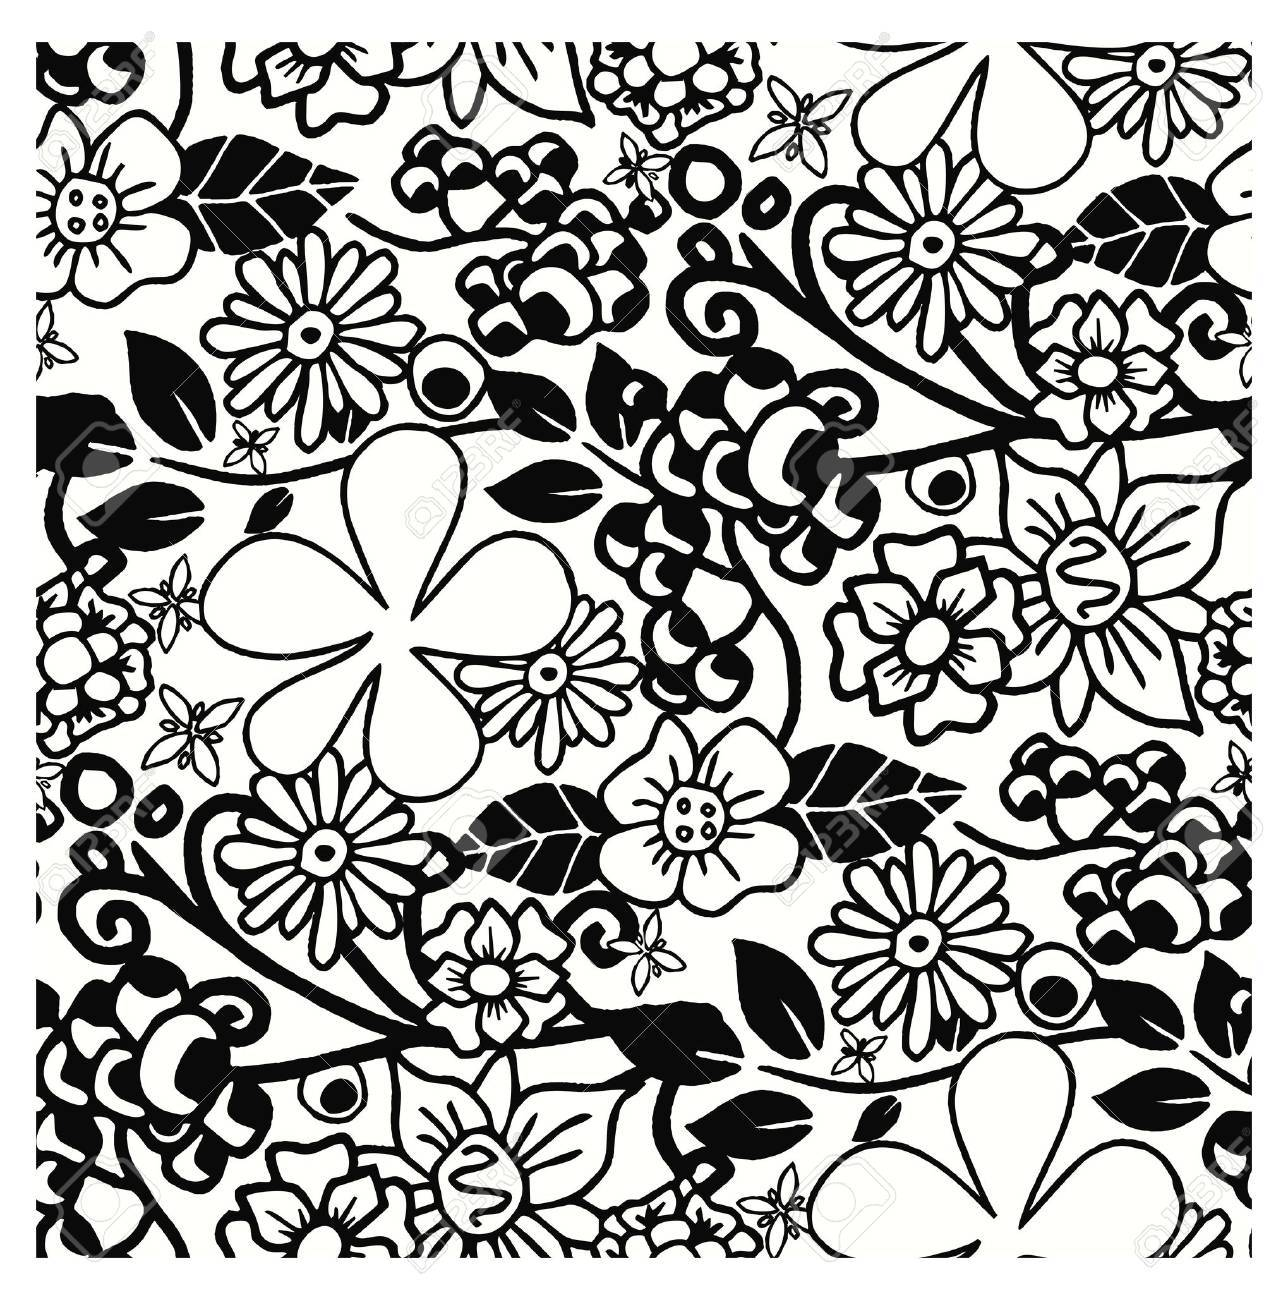 floral art full wallpaper Stock Vector - 15352220